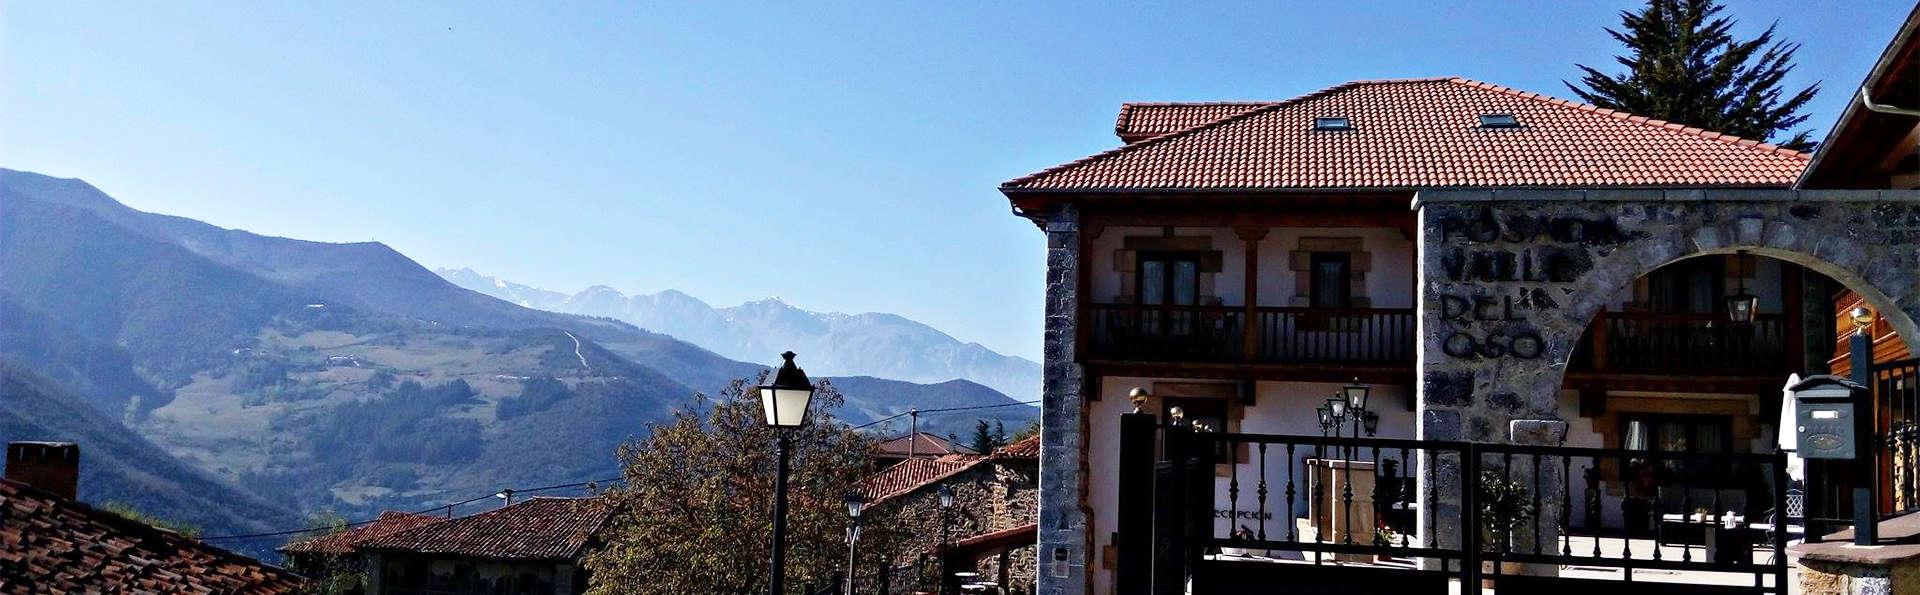 Posada Valle del Oso - EDIT_ext1.jpg